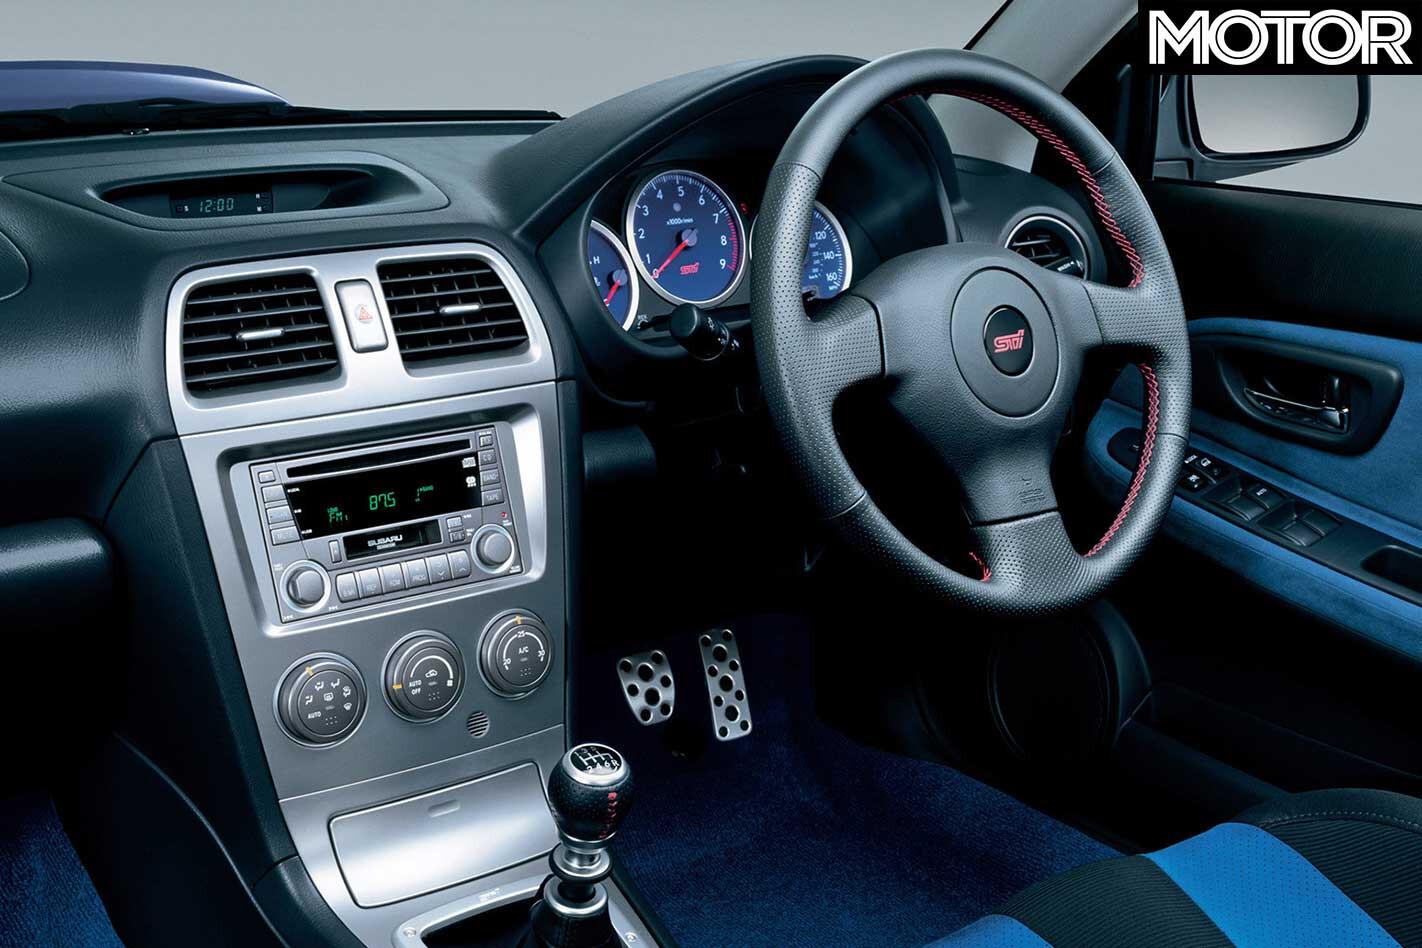 2005 Subaru Impreza WRX ST Interior Jpg